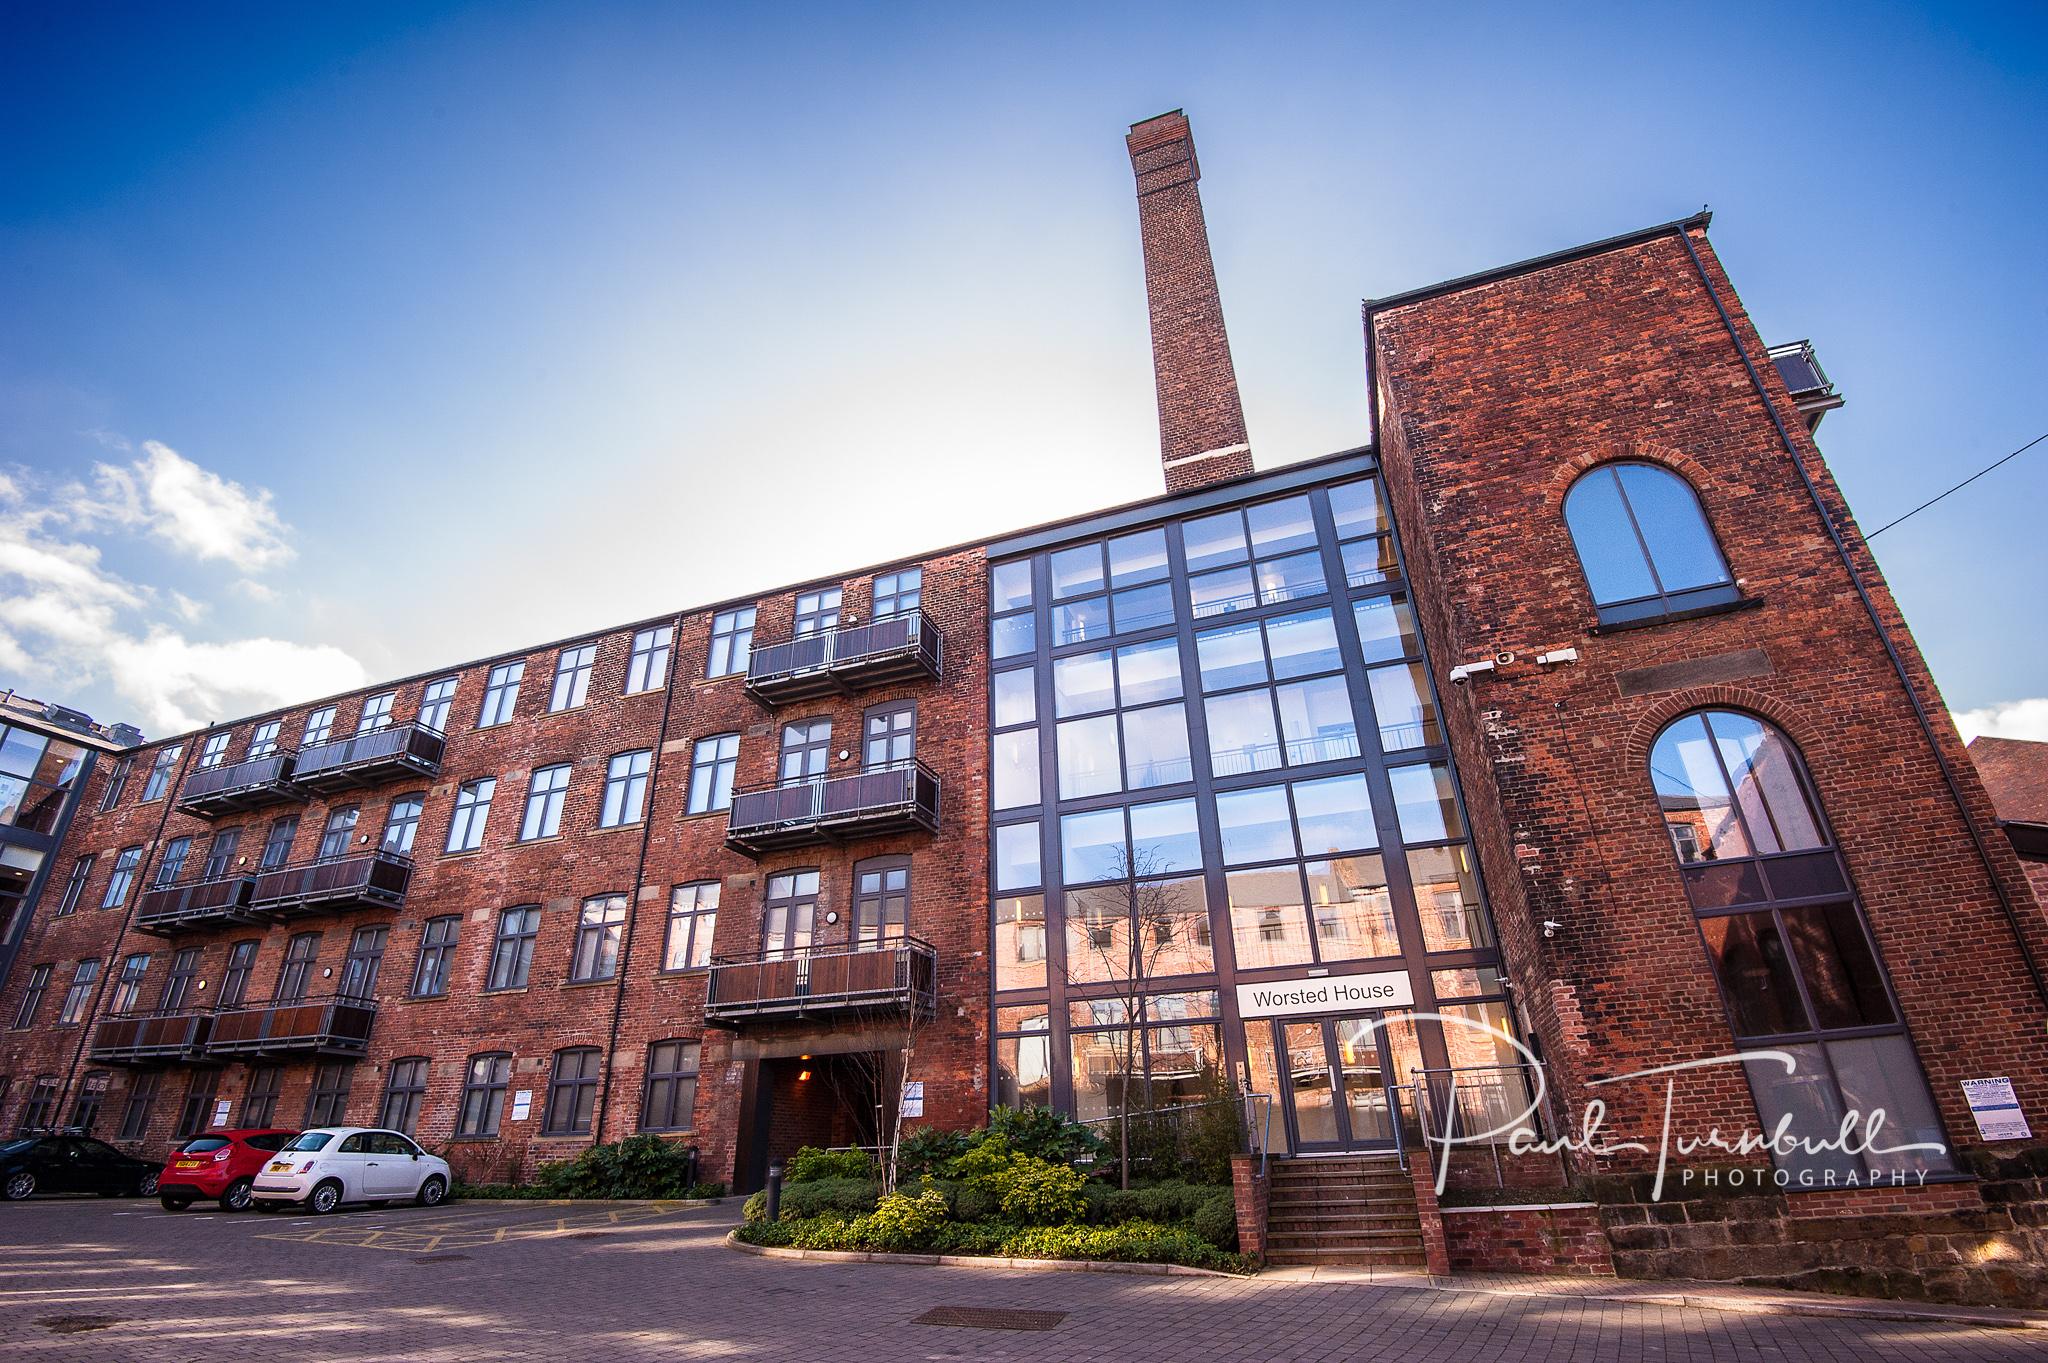 commercial-property-photographer-leeds-yorkshire-blackbrook-developments-004.jpg